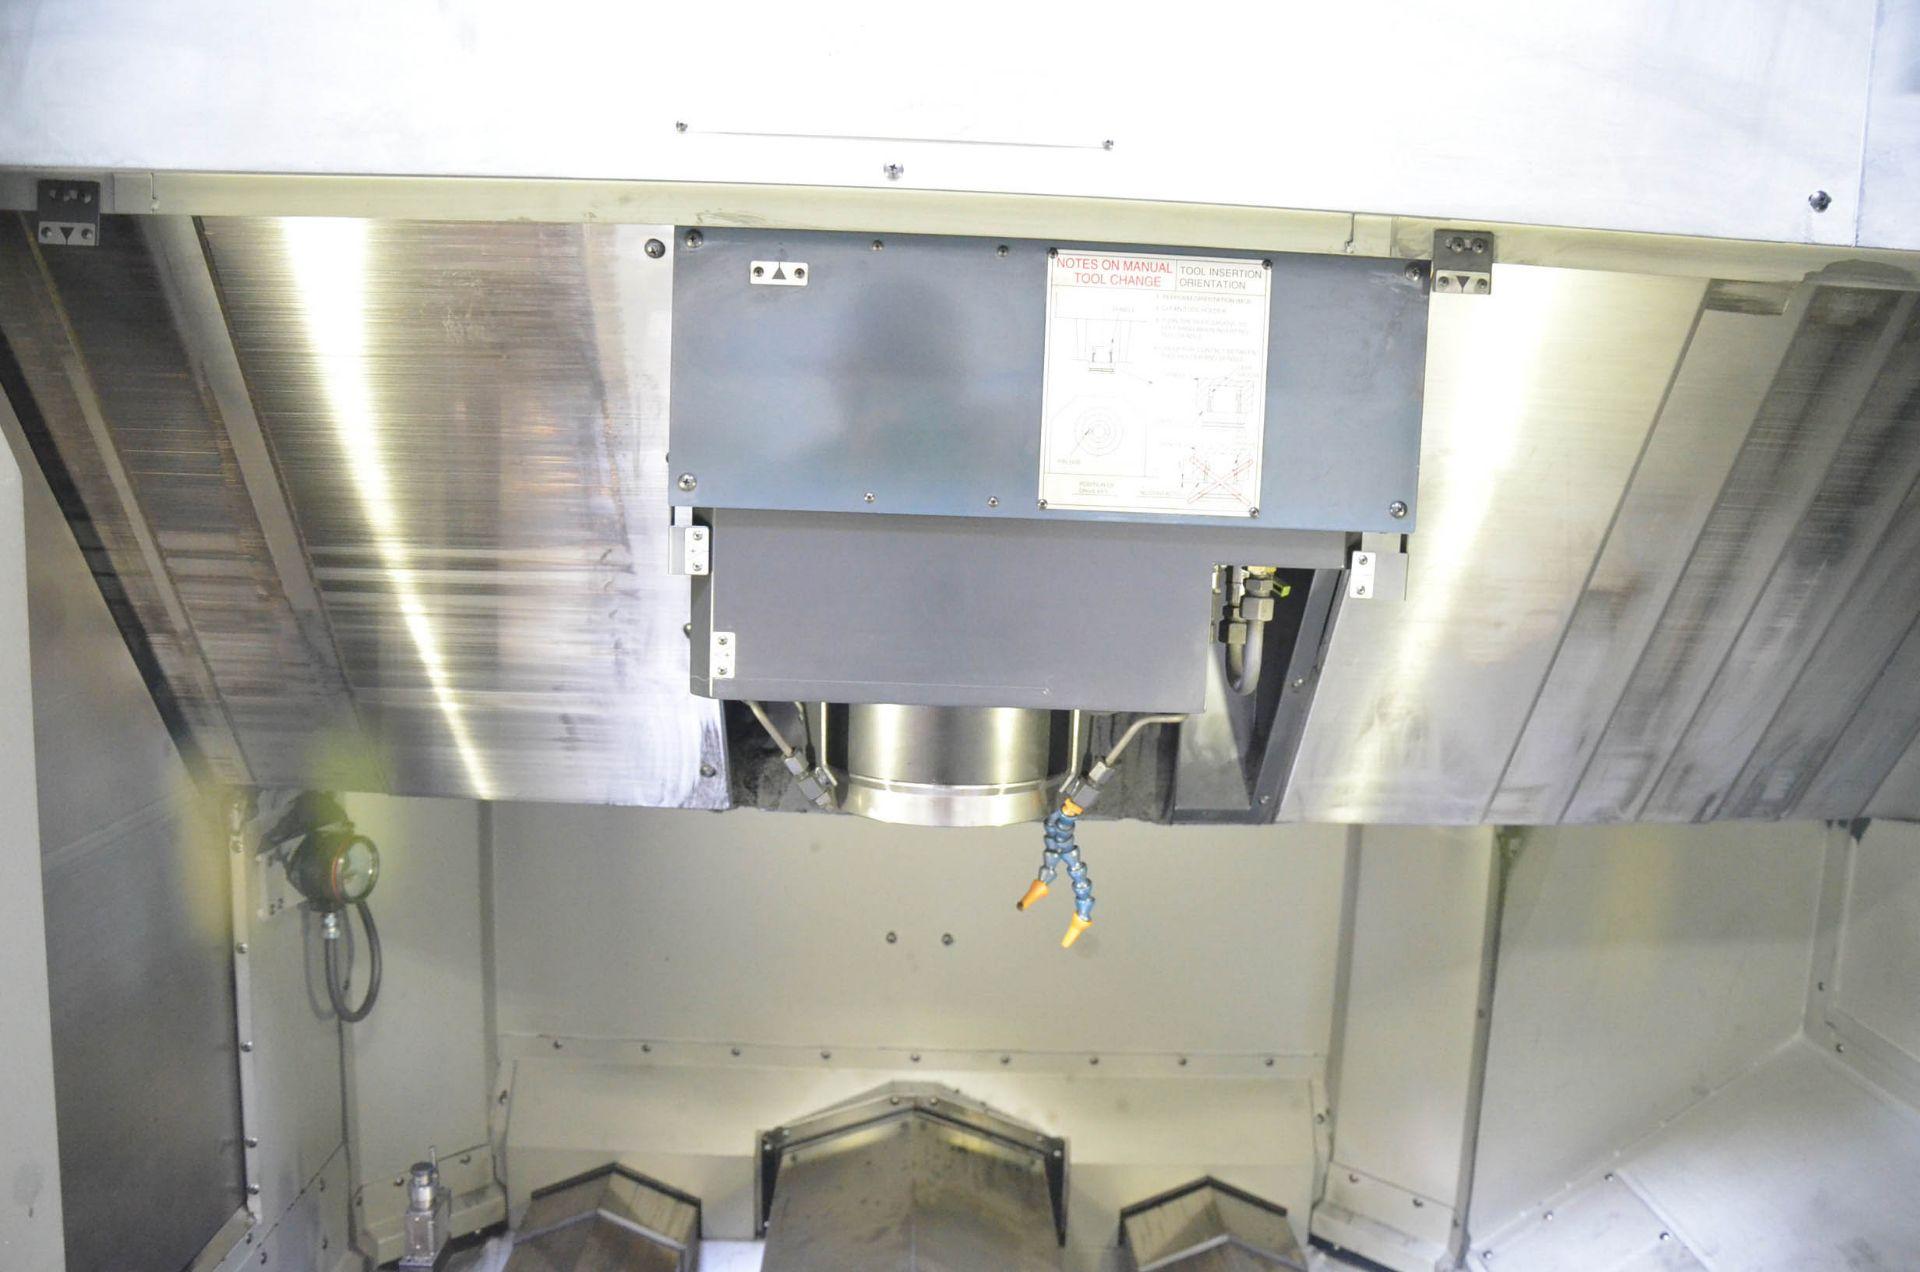 MAKINO (2008) V56 GRAPHITE CNC VERTICAL MACHINING CENTER WITH MAKINO PROFESSIONAL 5 TOUCHSCREEN - Image 7 of 10